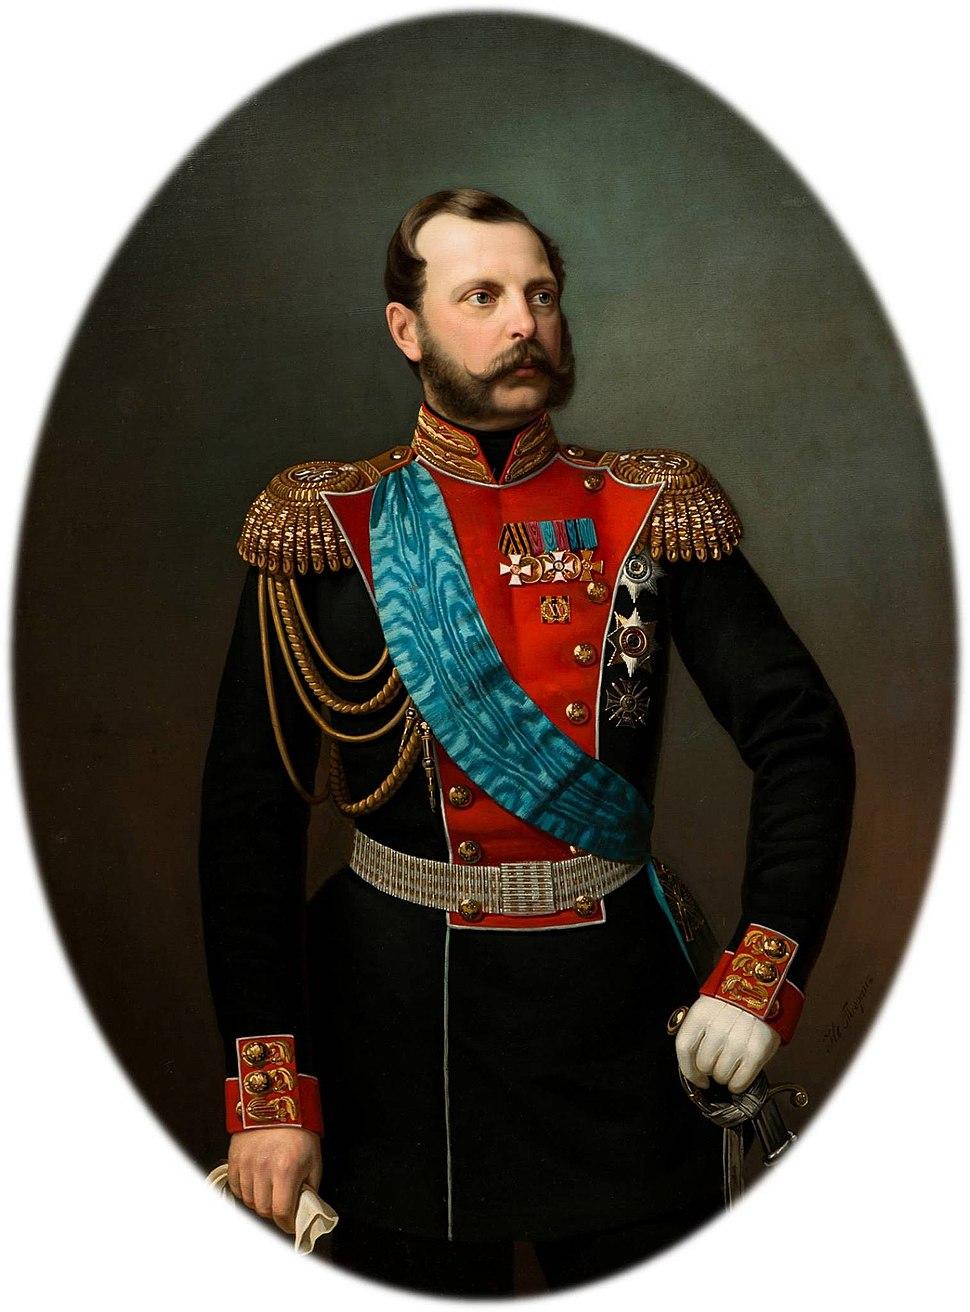 Alexander II by Ivan Tyurin (1860s, GIM)